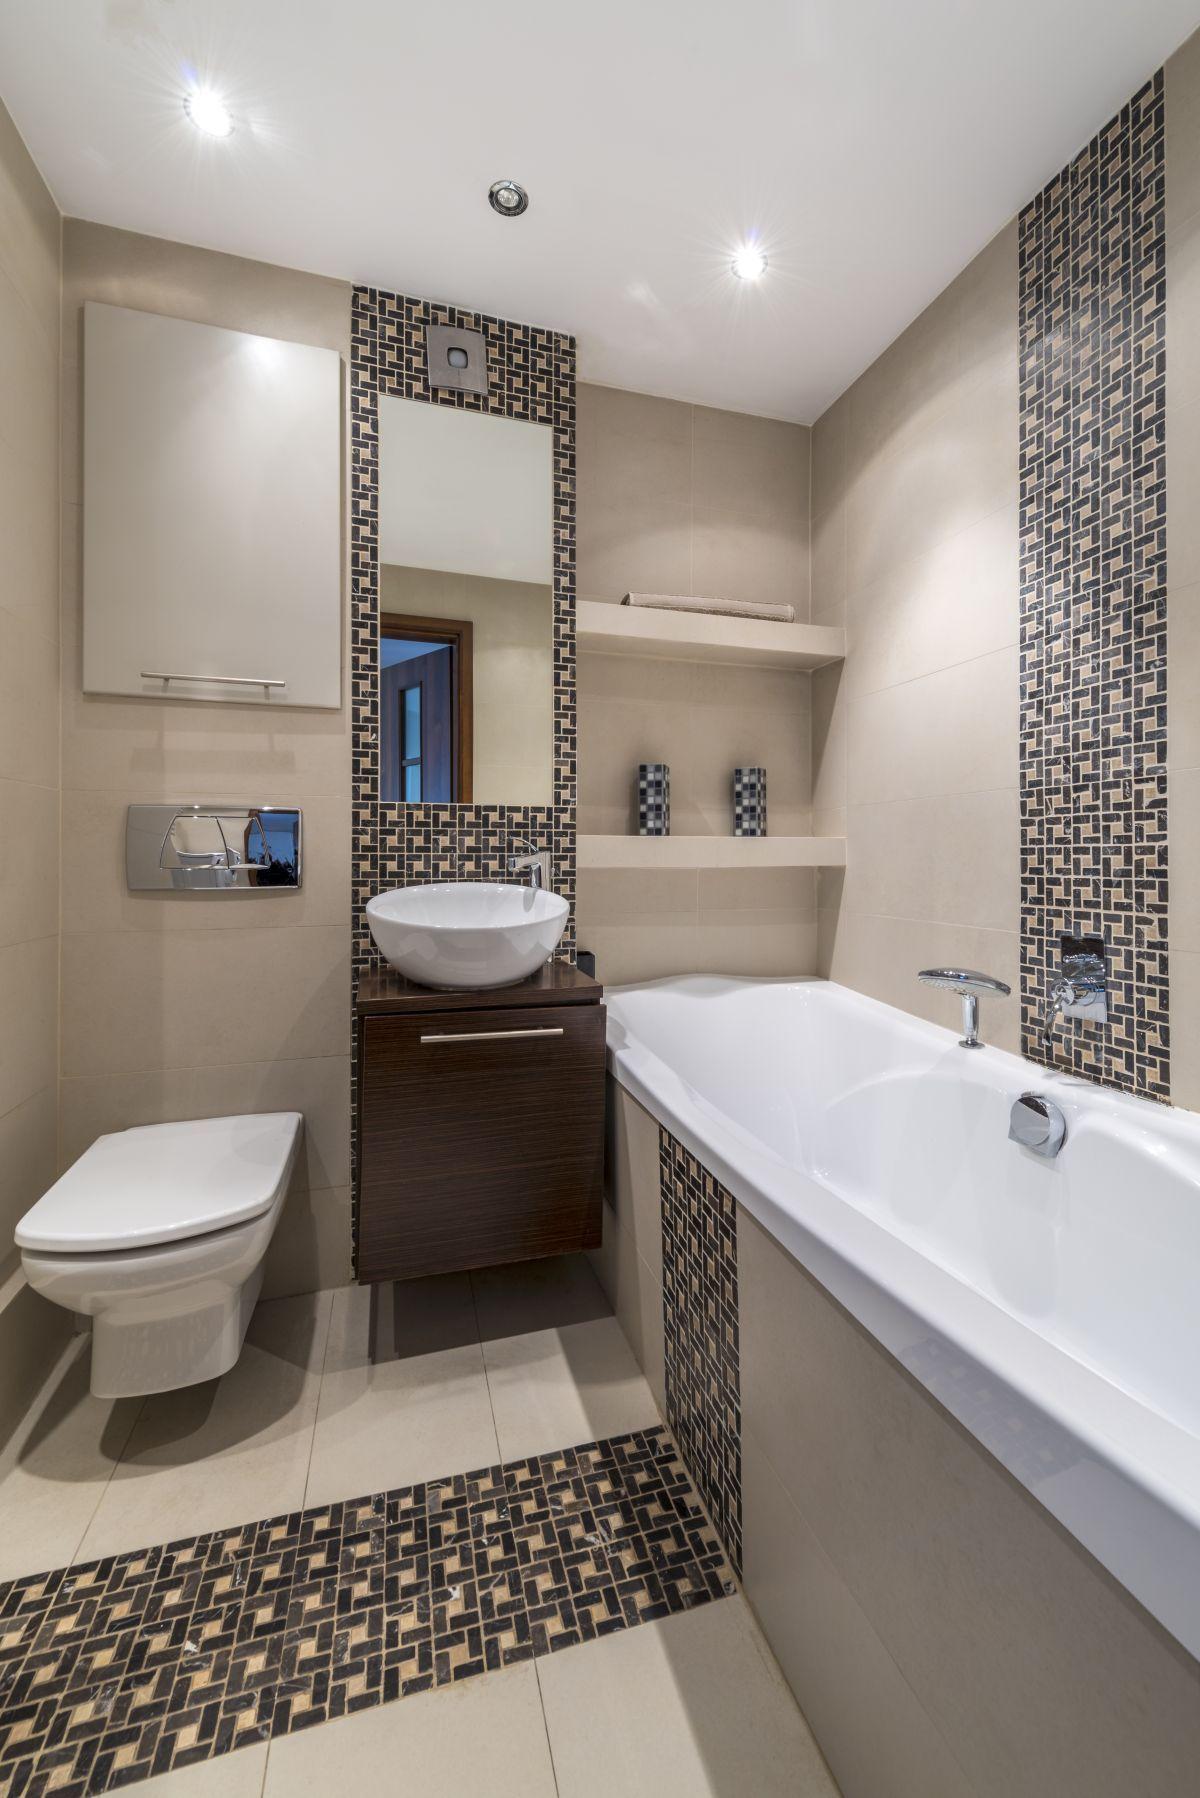 15 Bathroom Remodel Ideas Bathroom Remodel Ideas